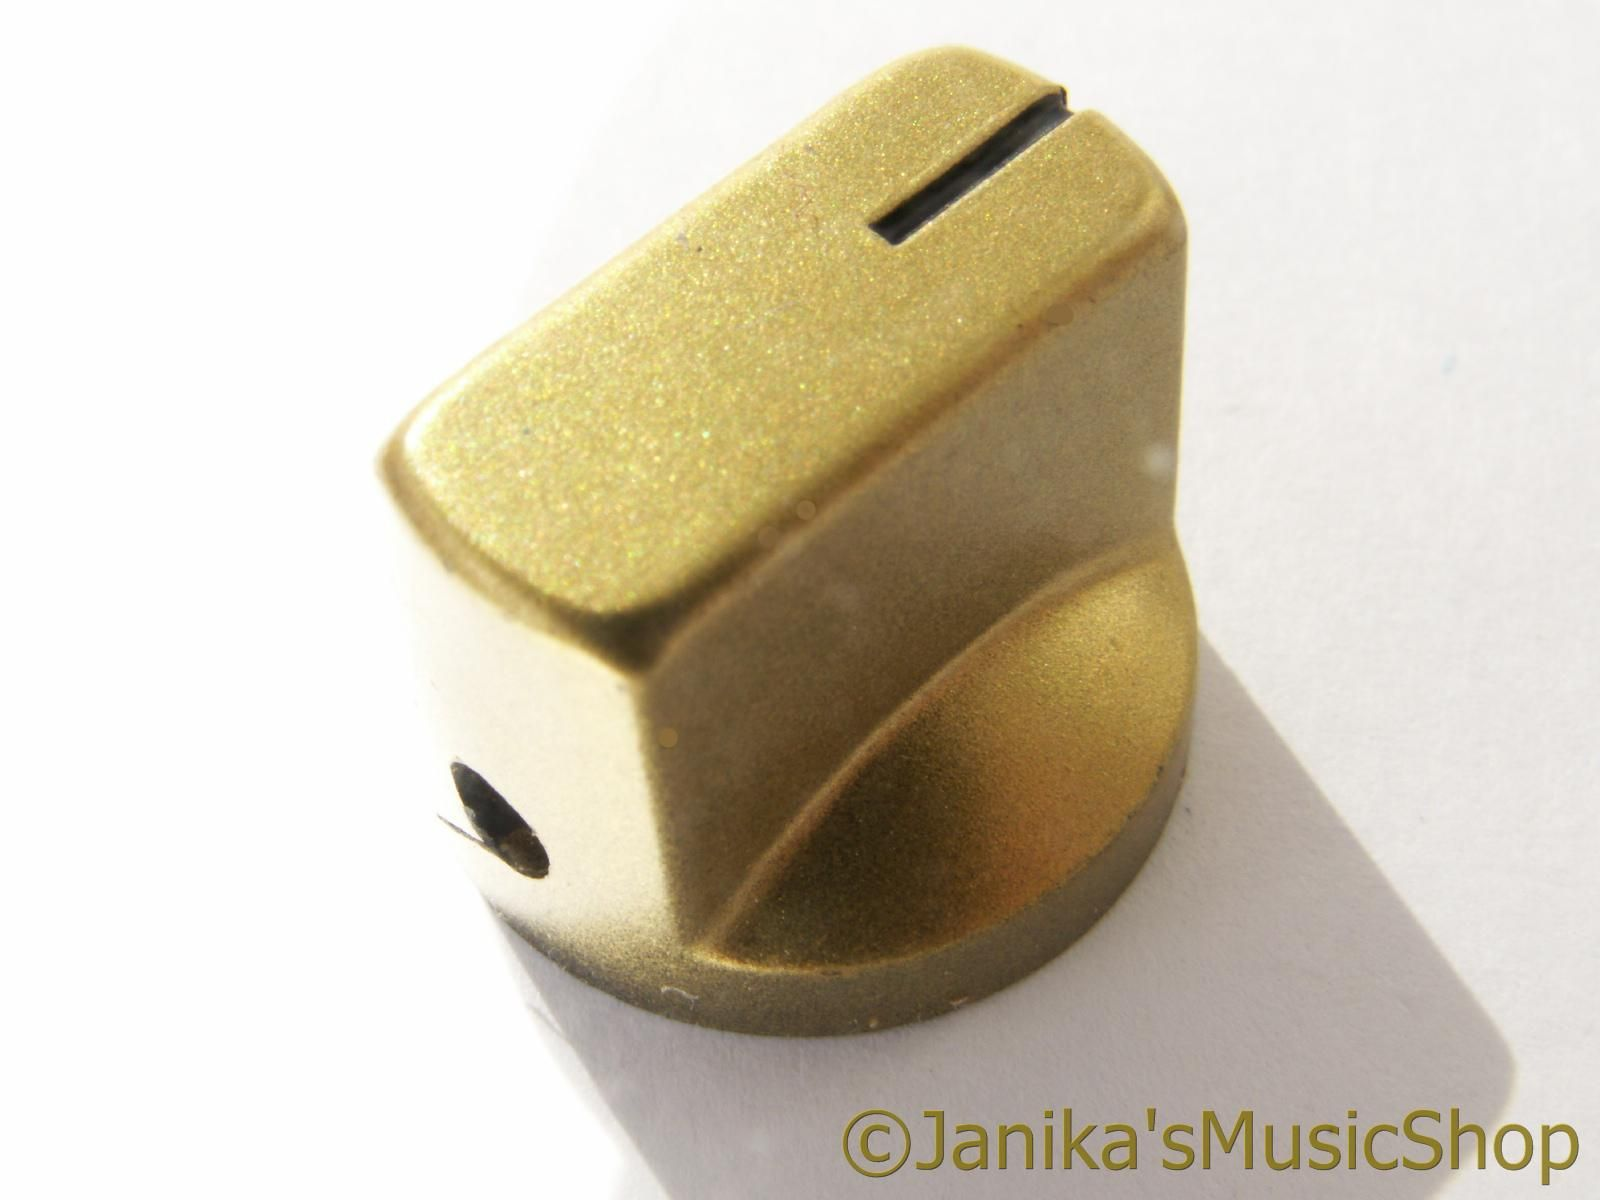 screw Yellow potentiometer knob guitar  amplifier  radio etc stove pot knob